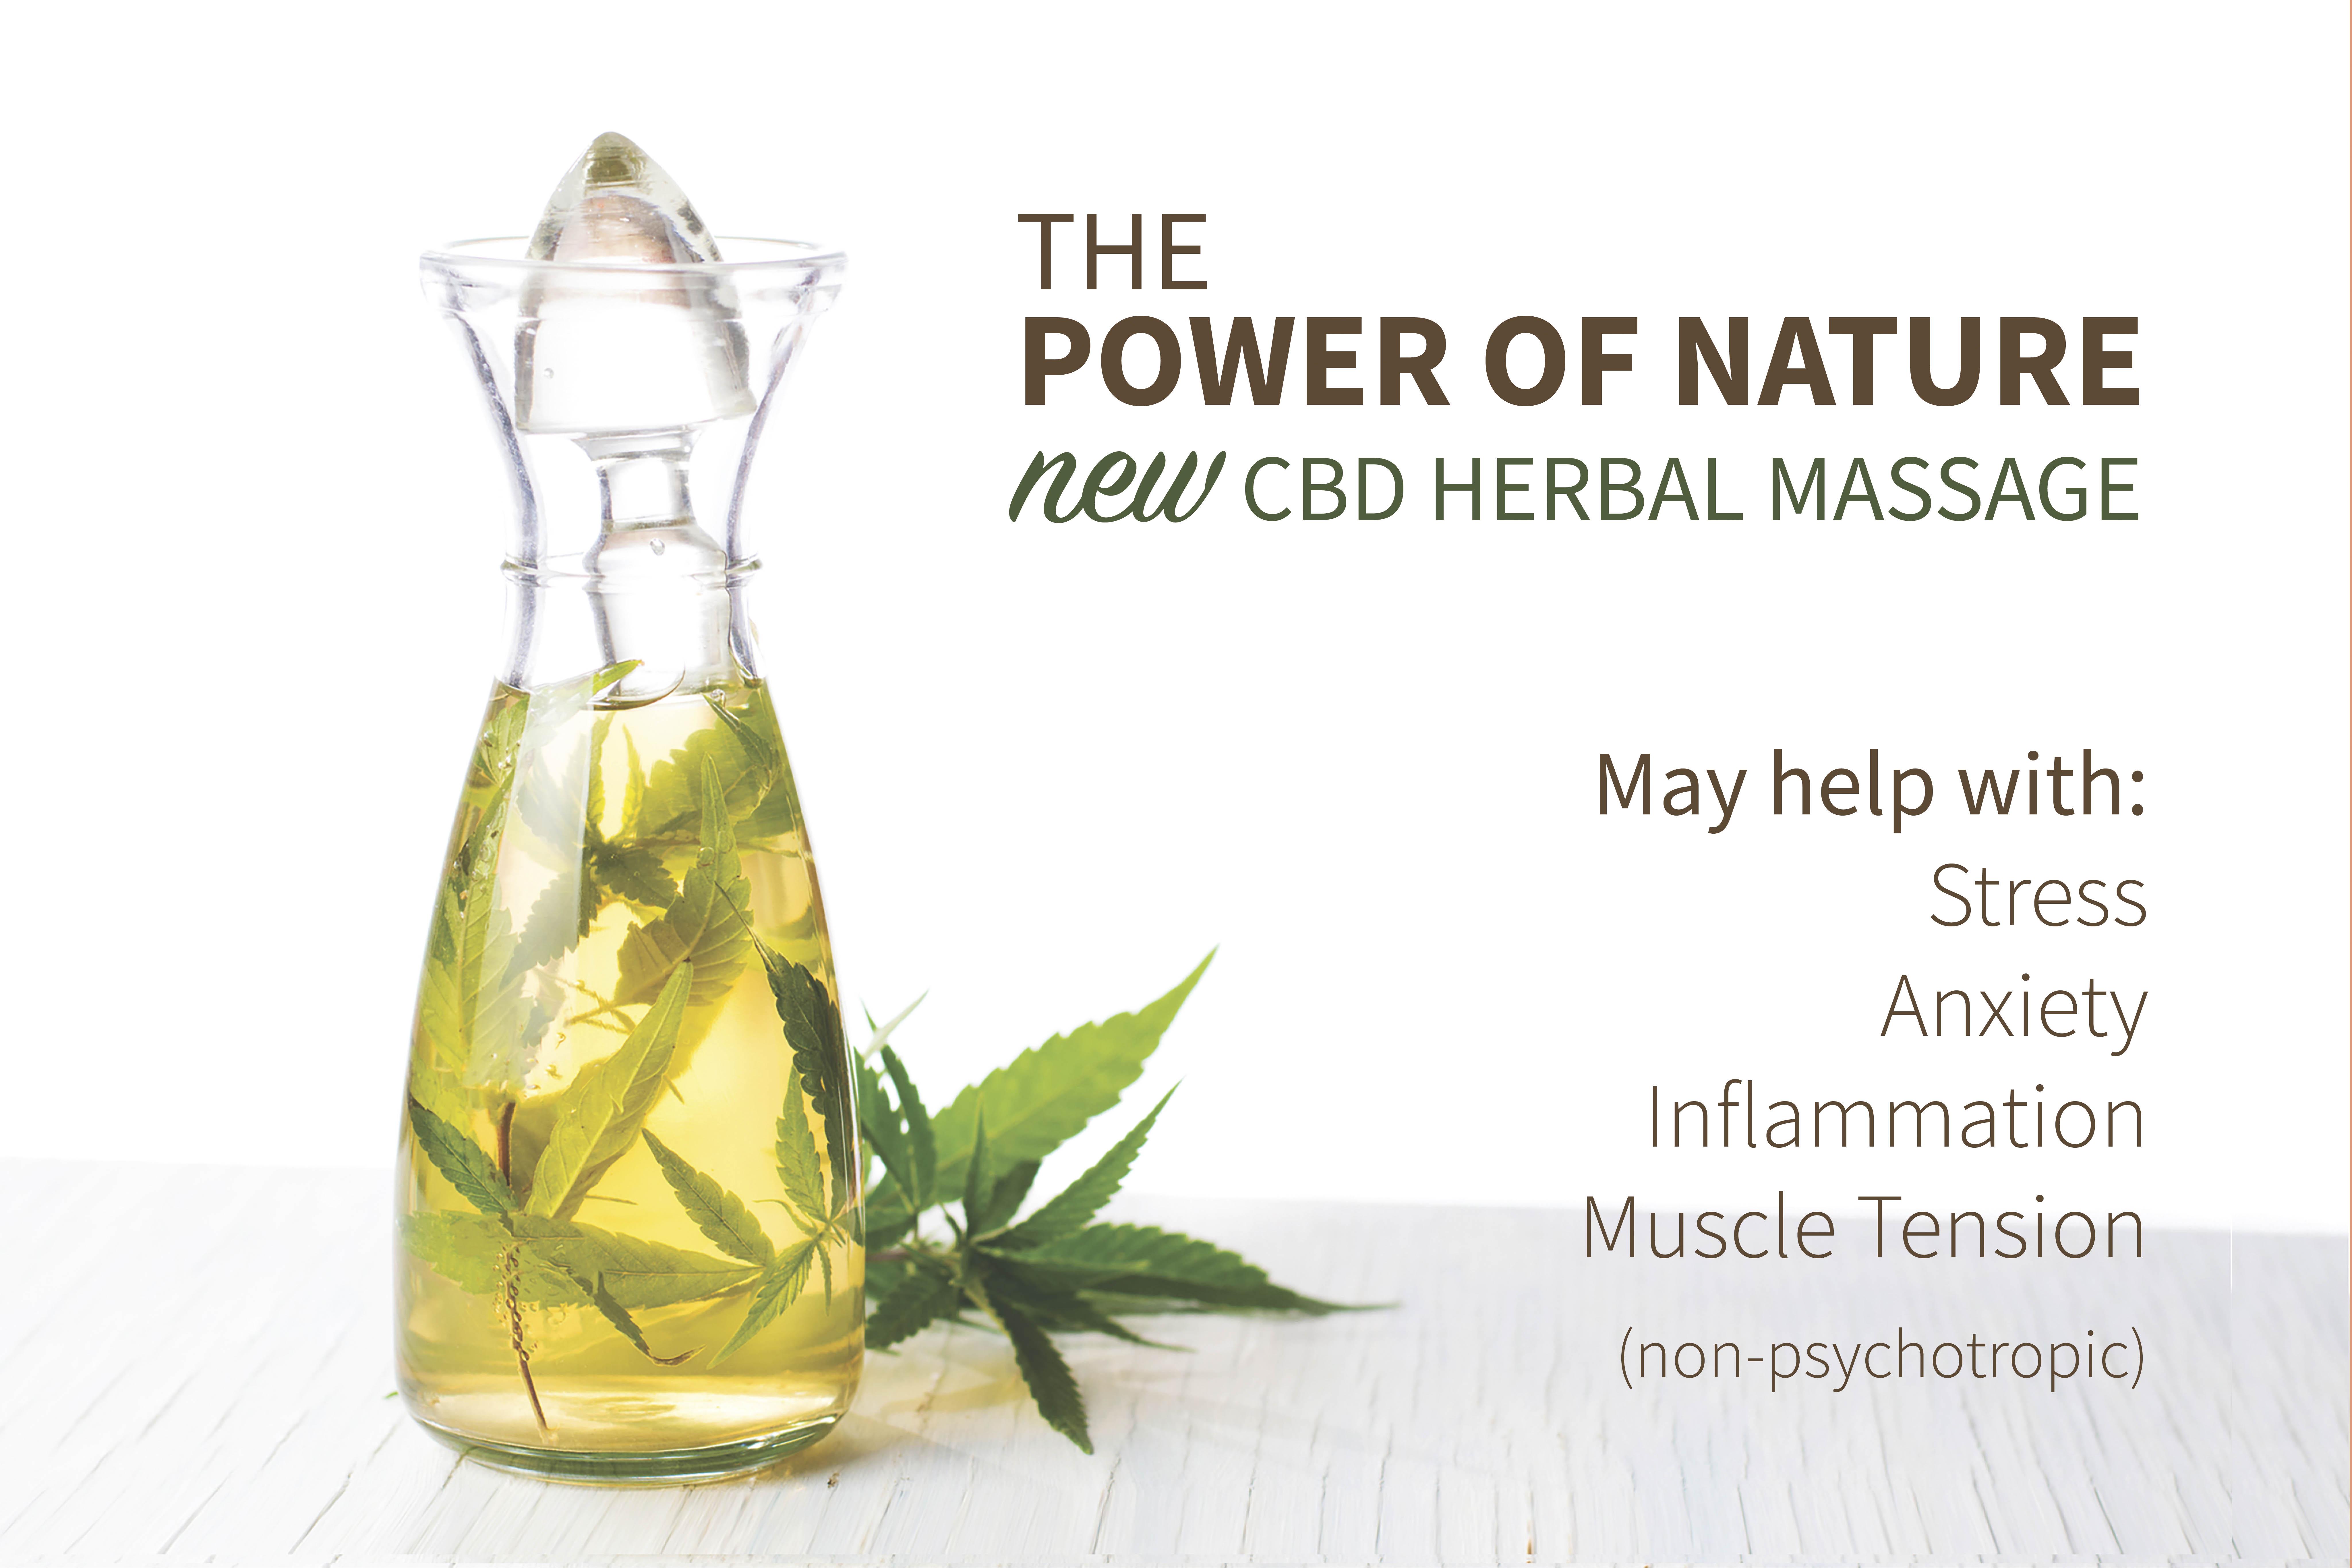 Why Use Cbd Oil In Massage